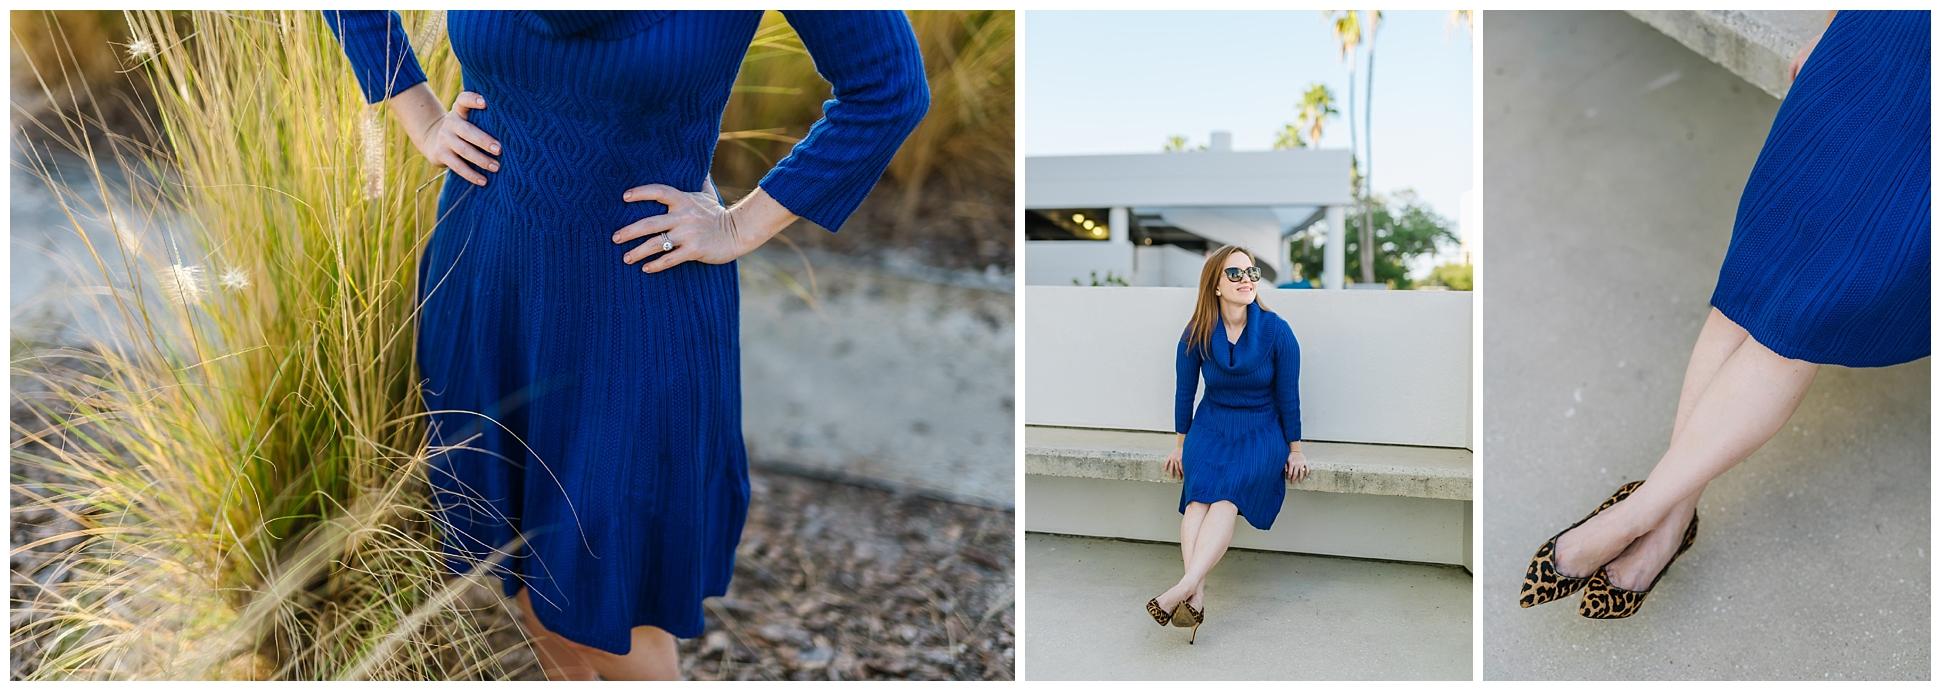 Tampa-lifestyle-bradning-fashion-blogger-photographer_0007.jpg